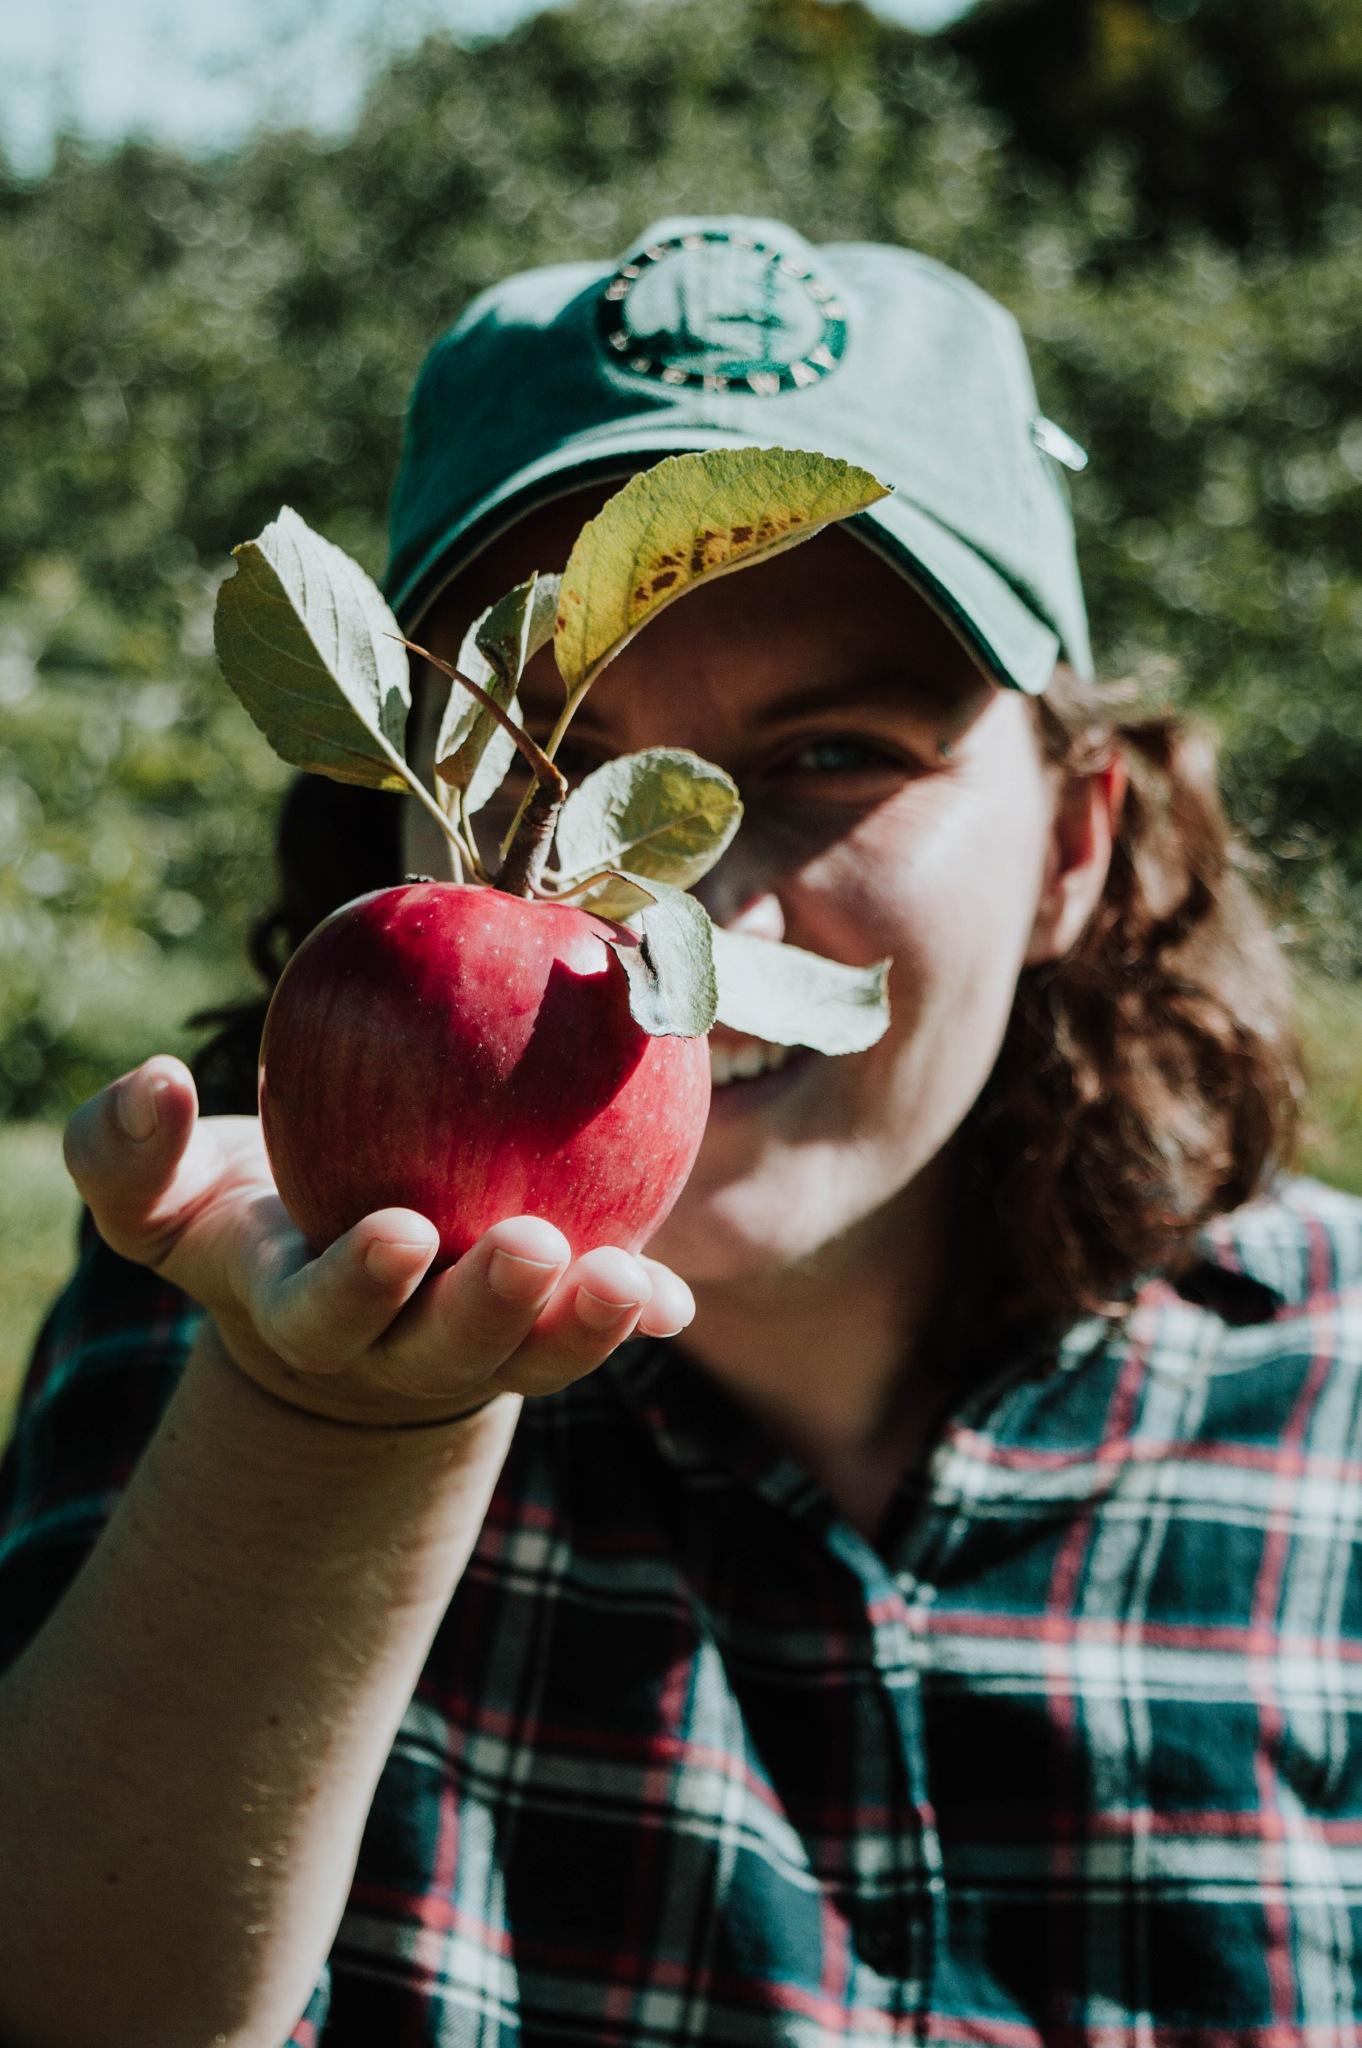 Apple of my eye by Isabel Gregg